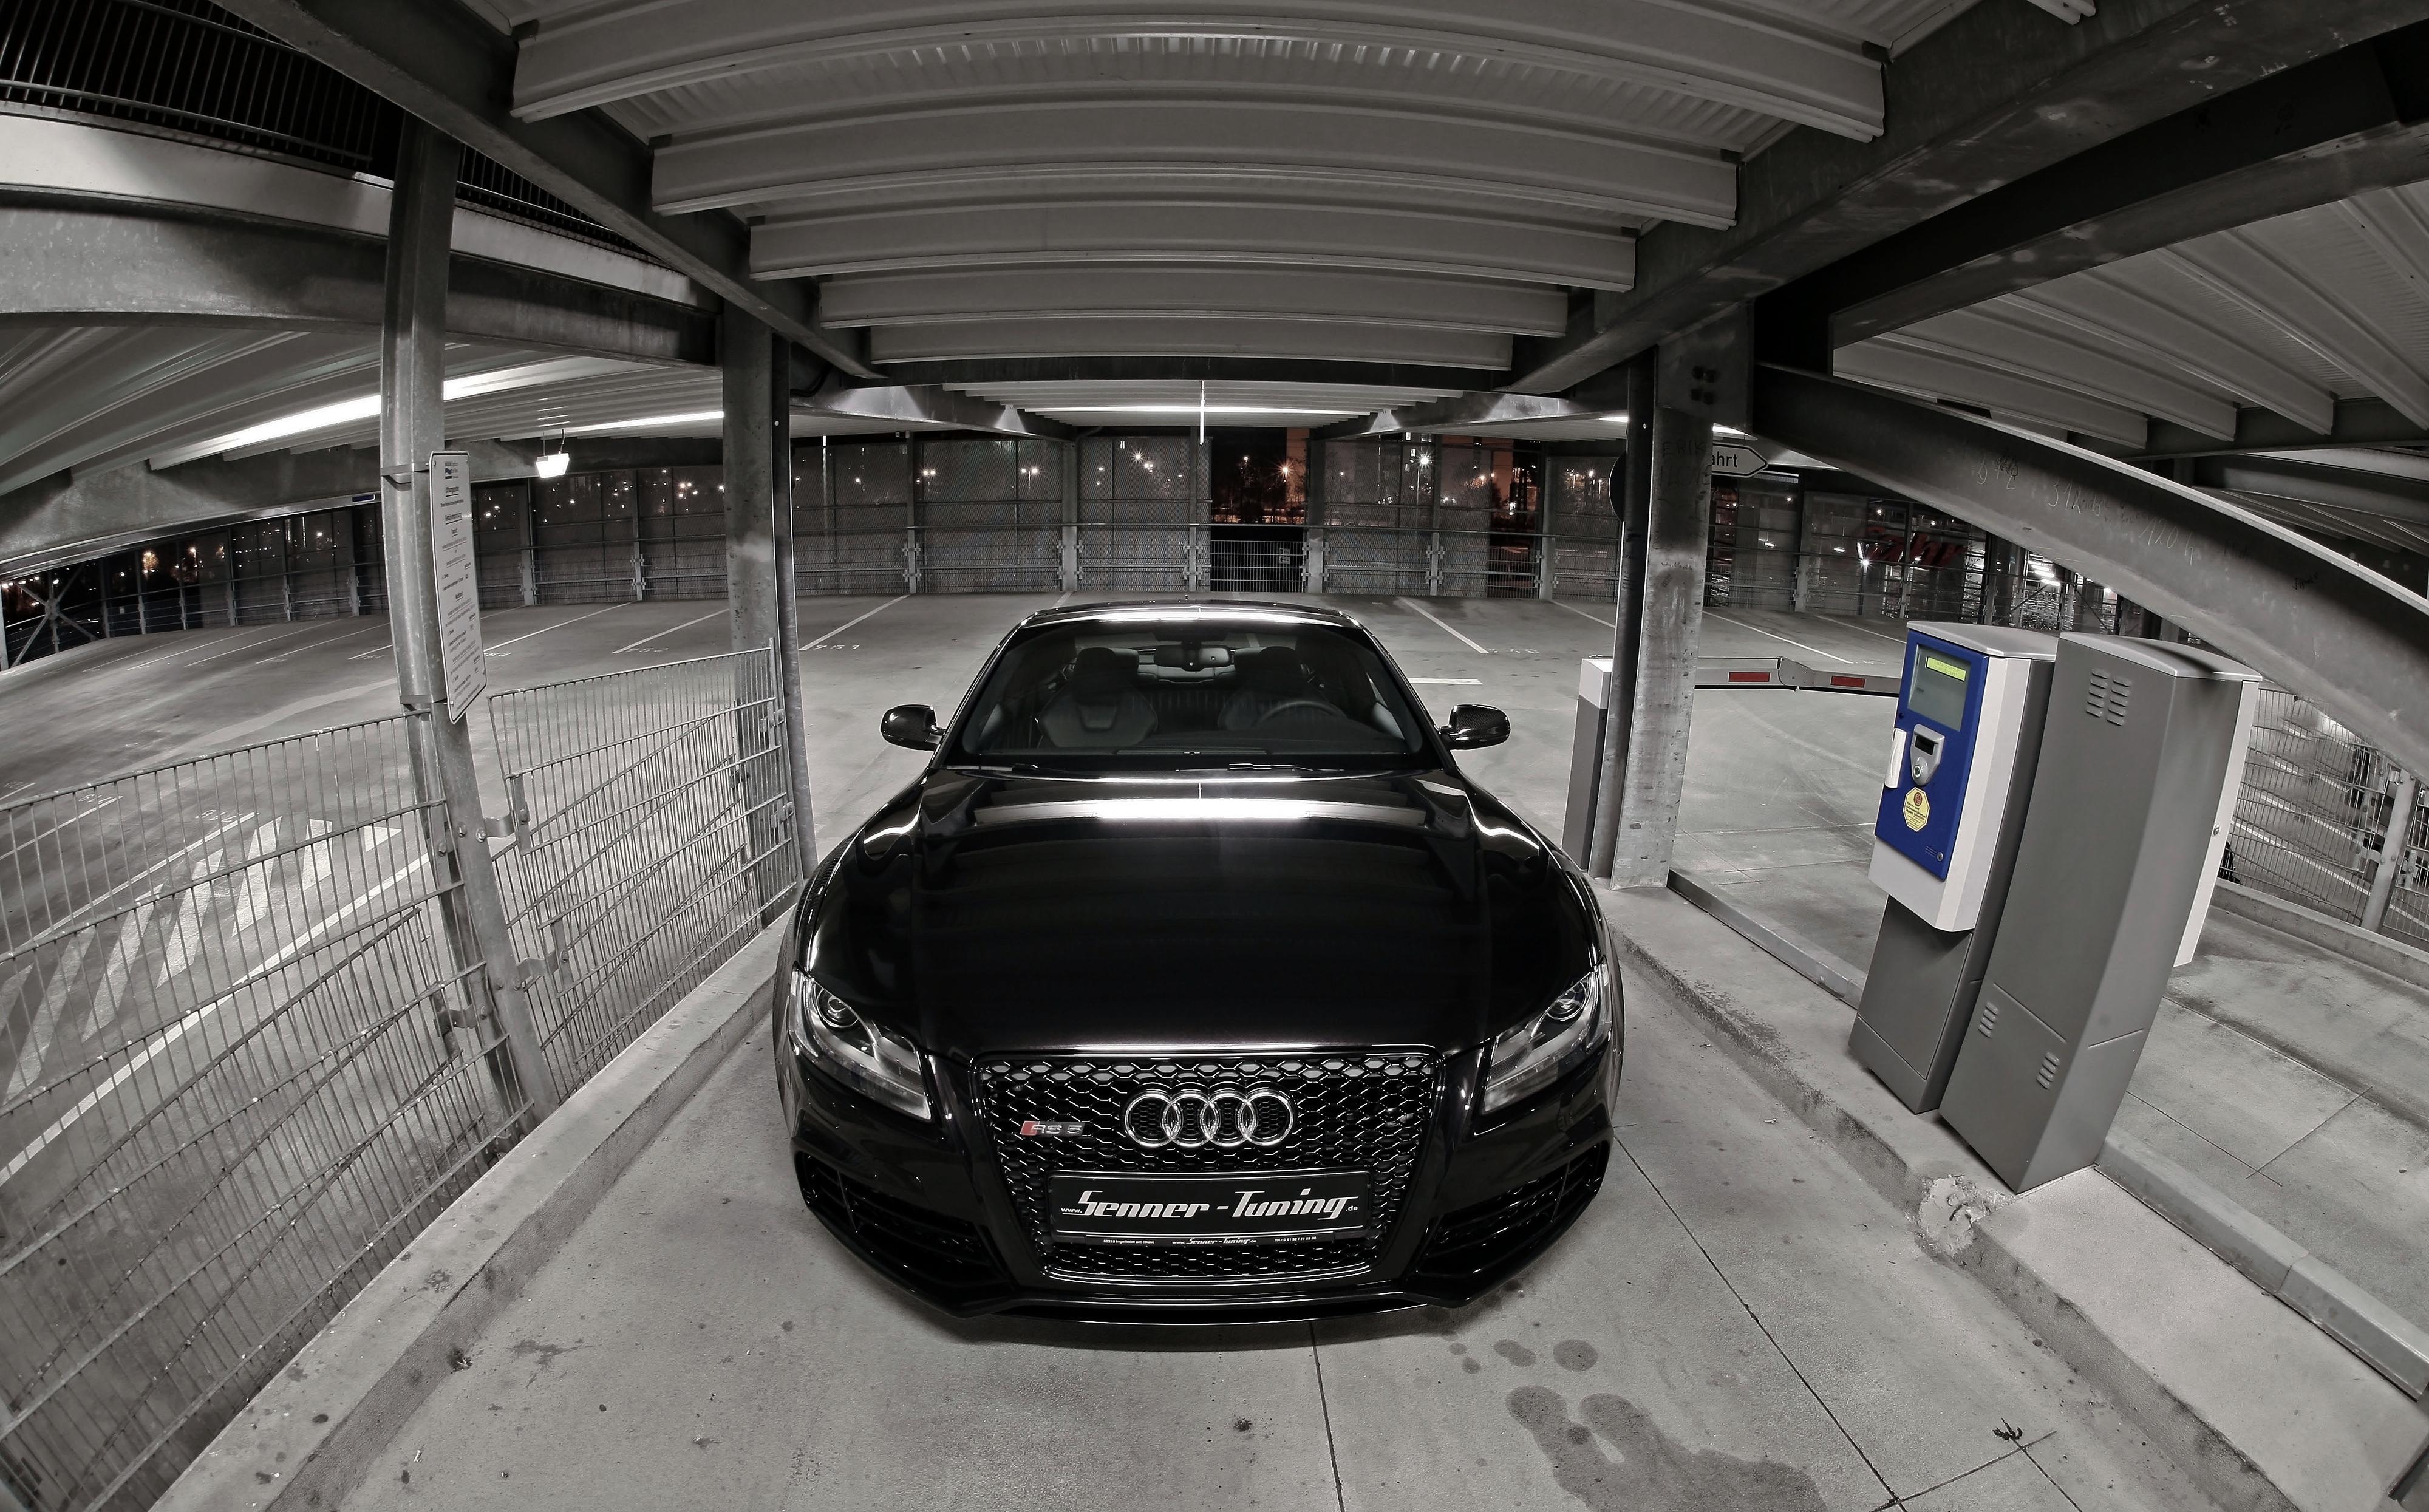 81324 скачать обои Тачки (Cars), Ауди (Audi), Rs5, Тюнинг, Вид Спереди - заставки и картинки бесплатно